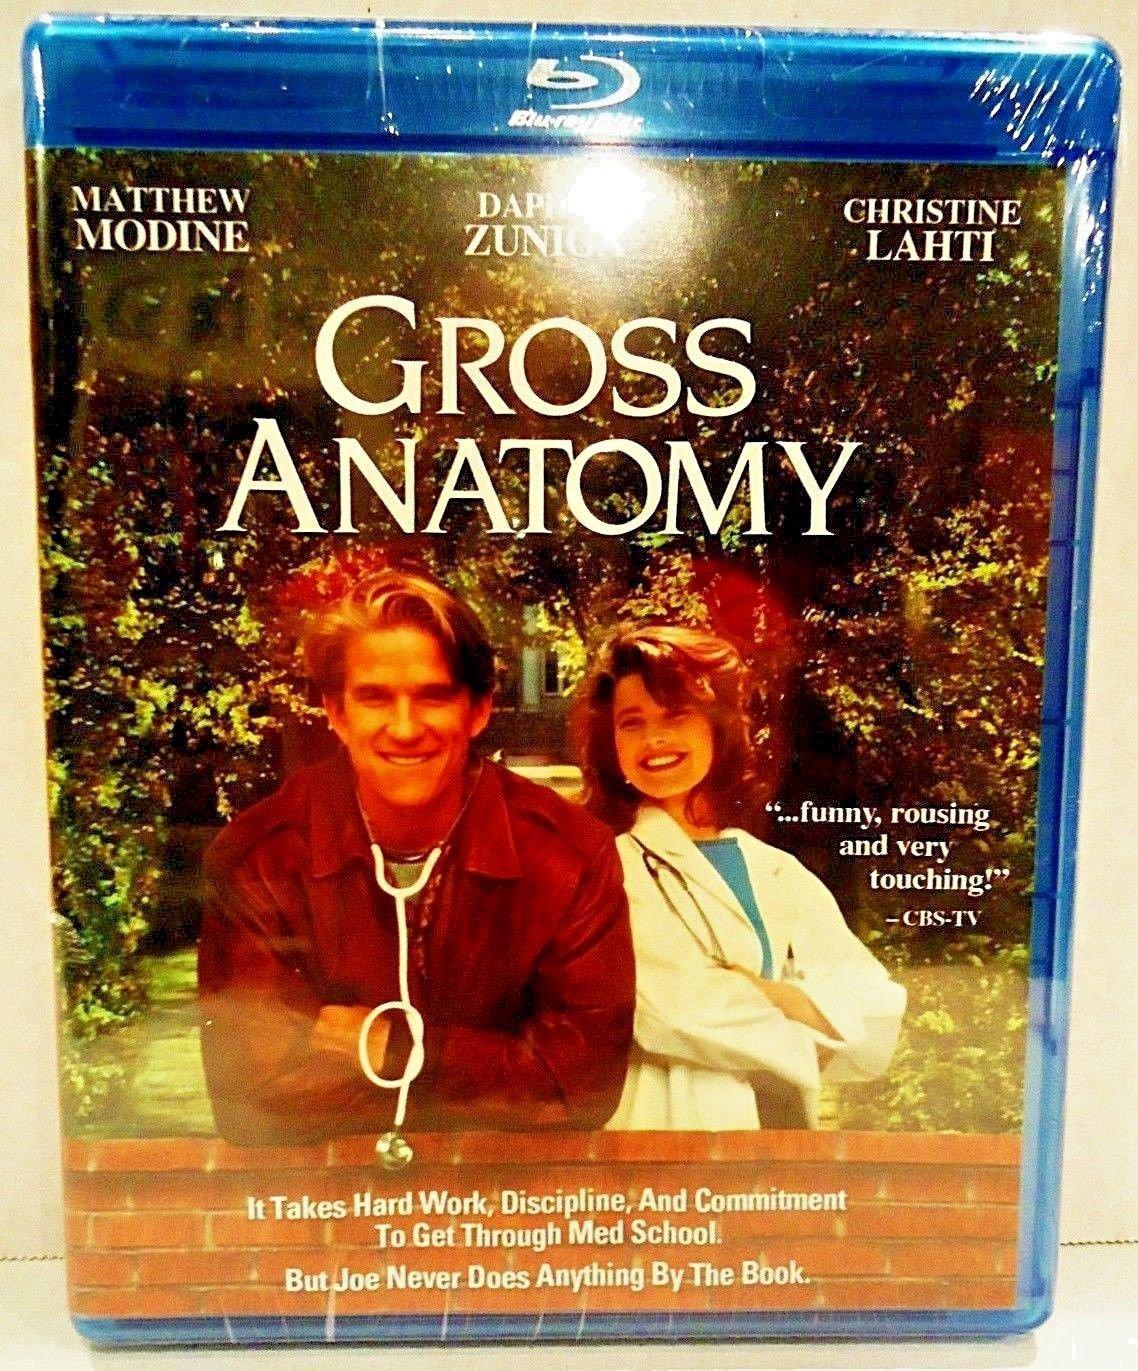 GROSS ANATOMY - DVD - BLU-RAY - MATTHEW MODINE - BRAND NEW - HOUSE - ER - MOVIE